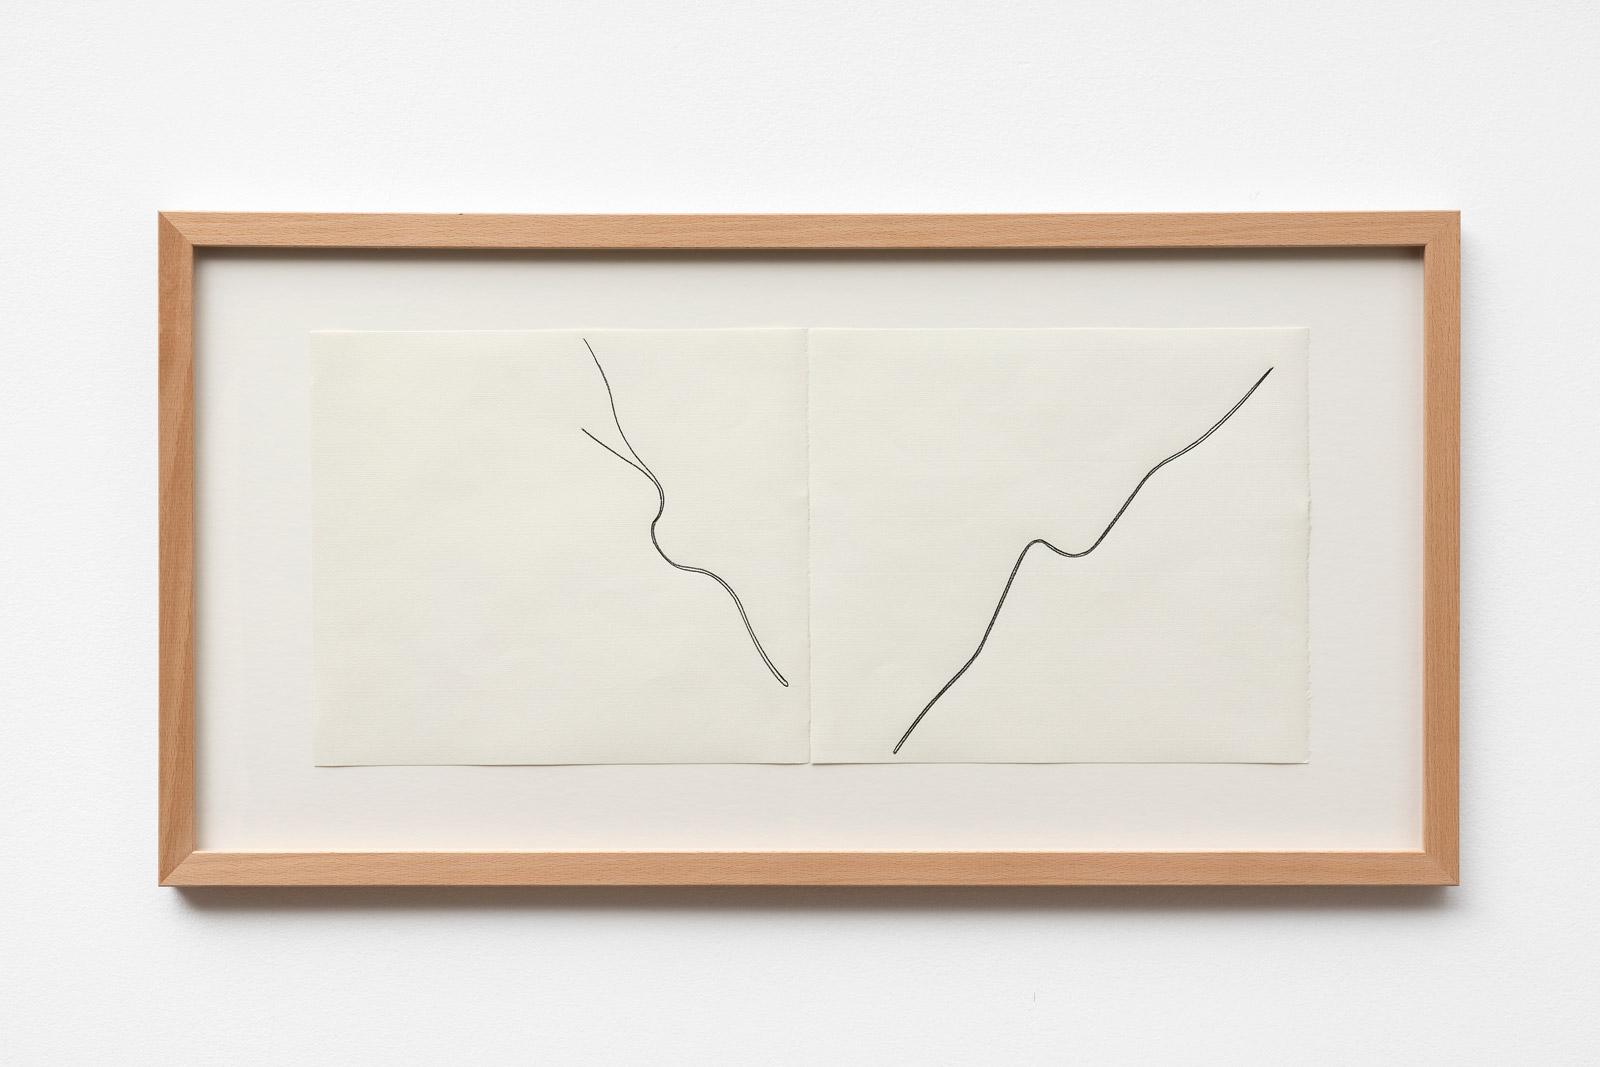 Christian Hanussek Double Feature 1 2019 pencil on paper 21 x 48 cm 33 x 625 cm framed